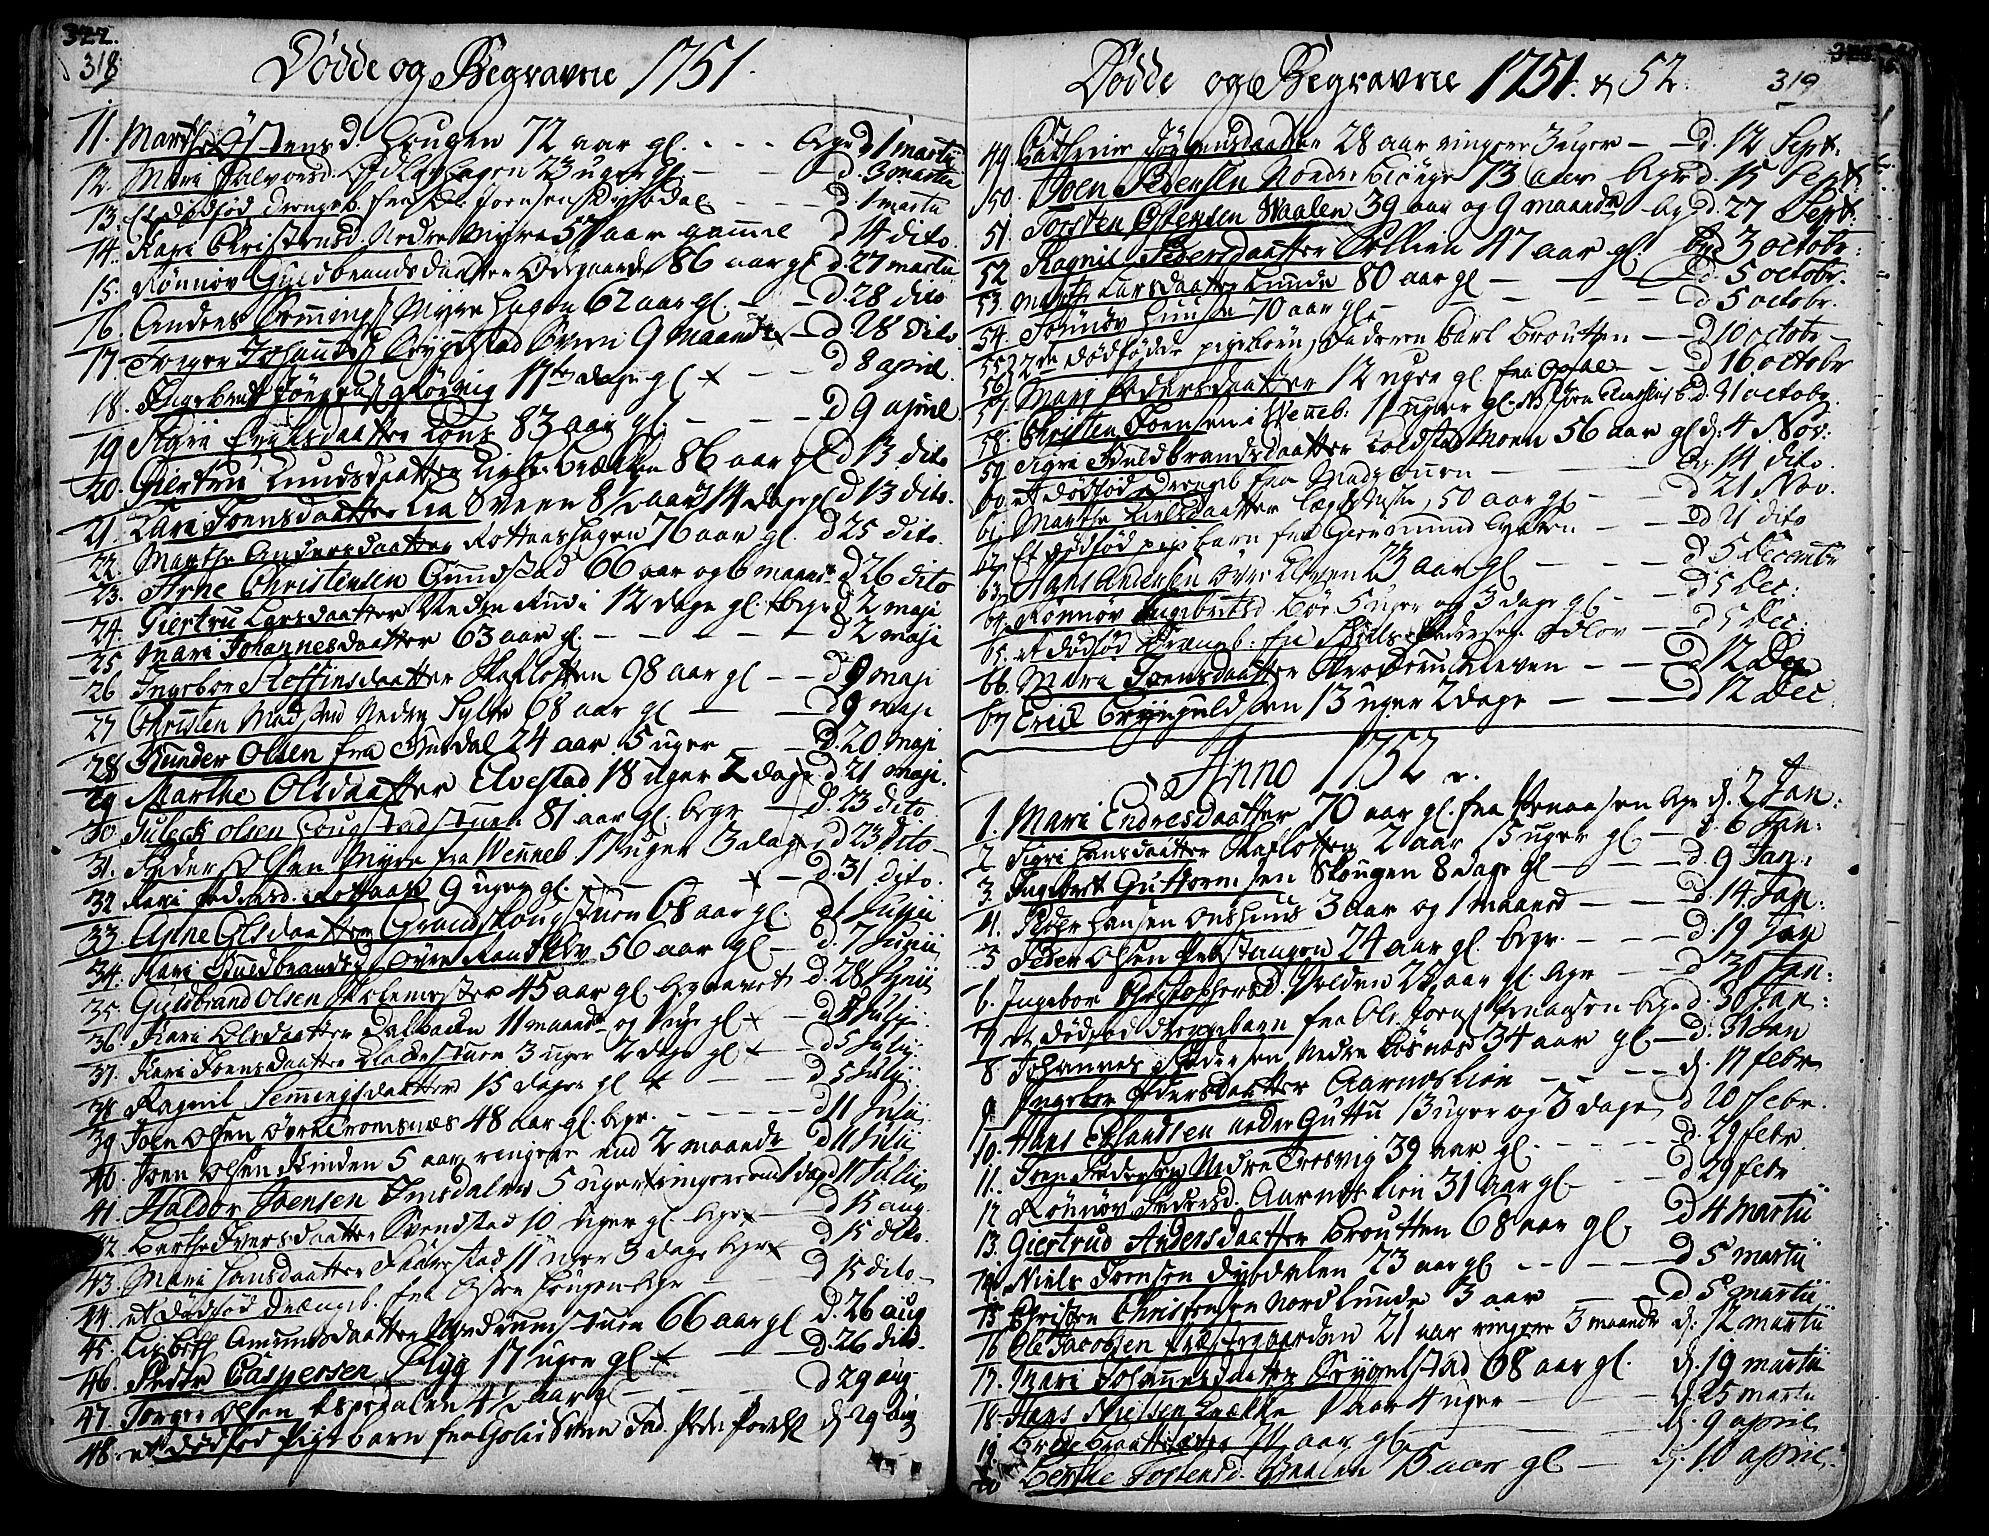 SAH, Ringebu prestekontor, Ministerialbok nr. 2, 1734-1780, s. 318-319